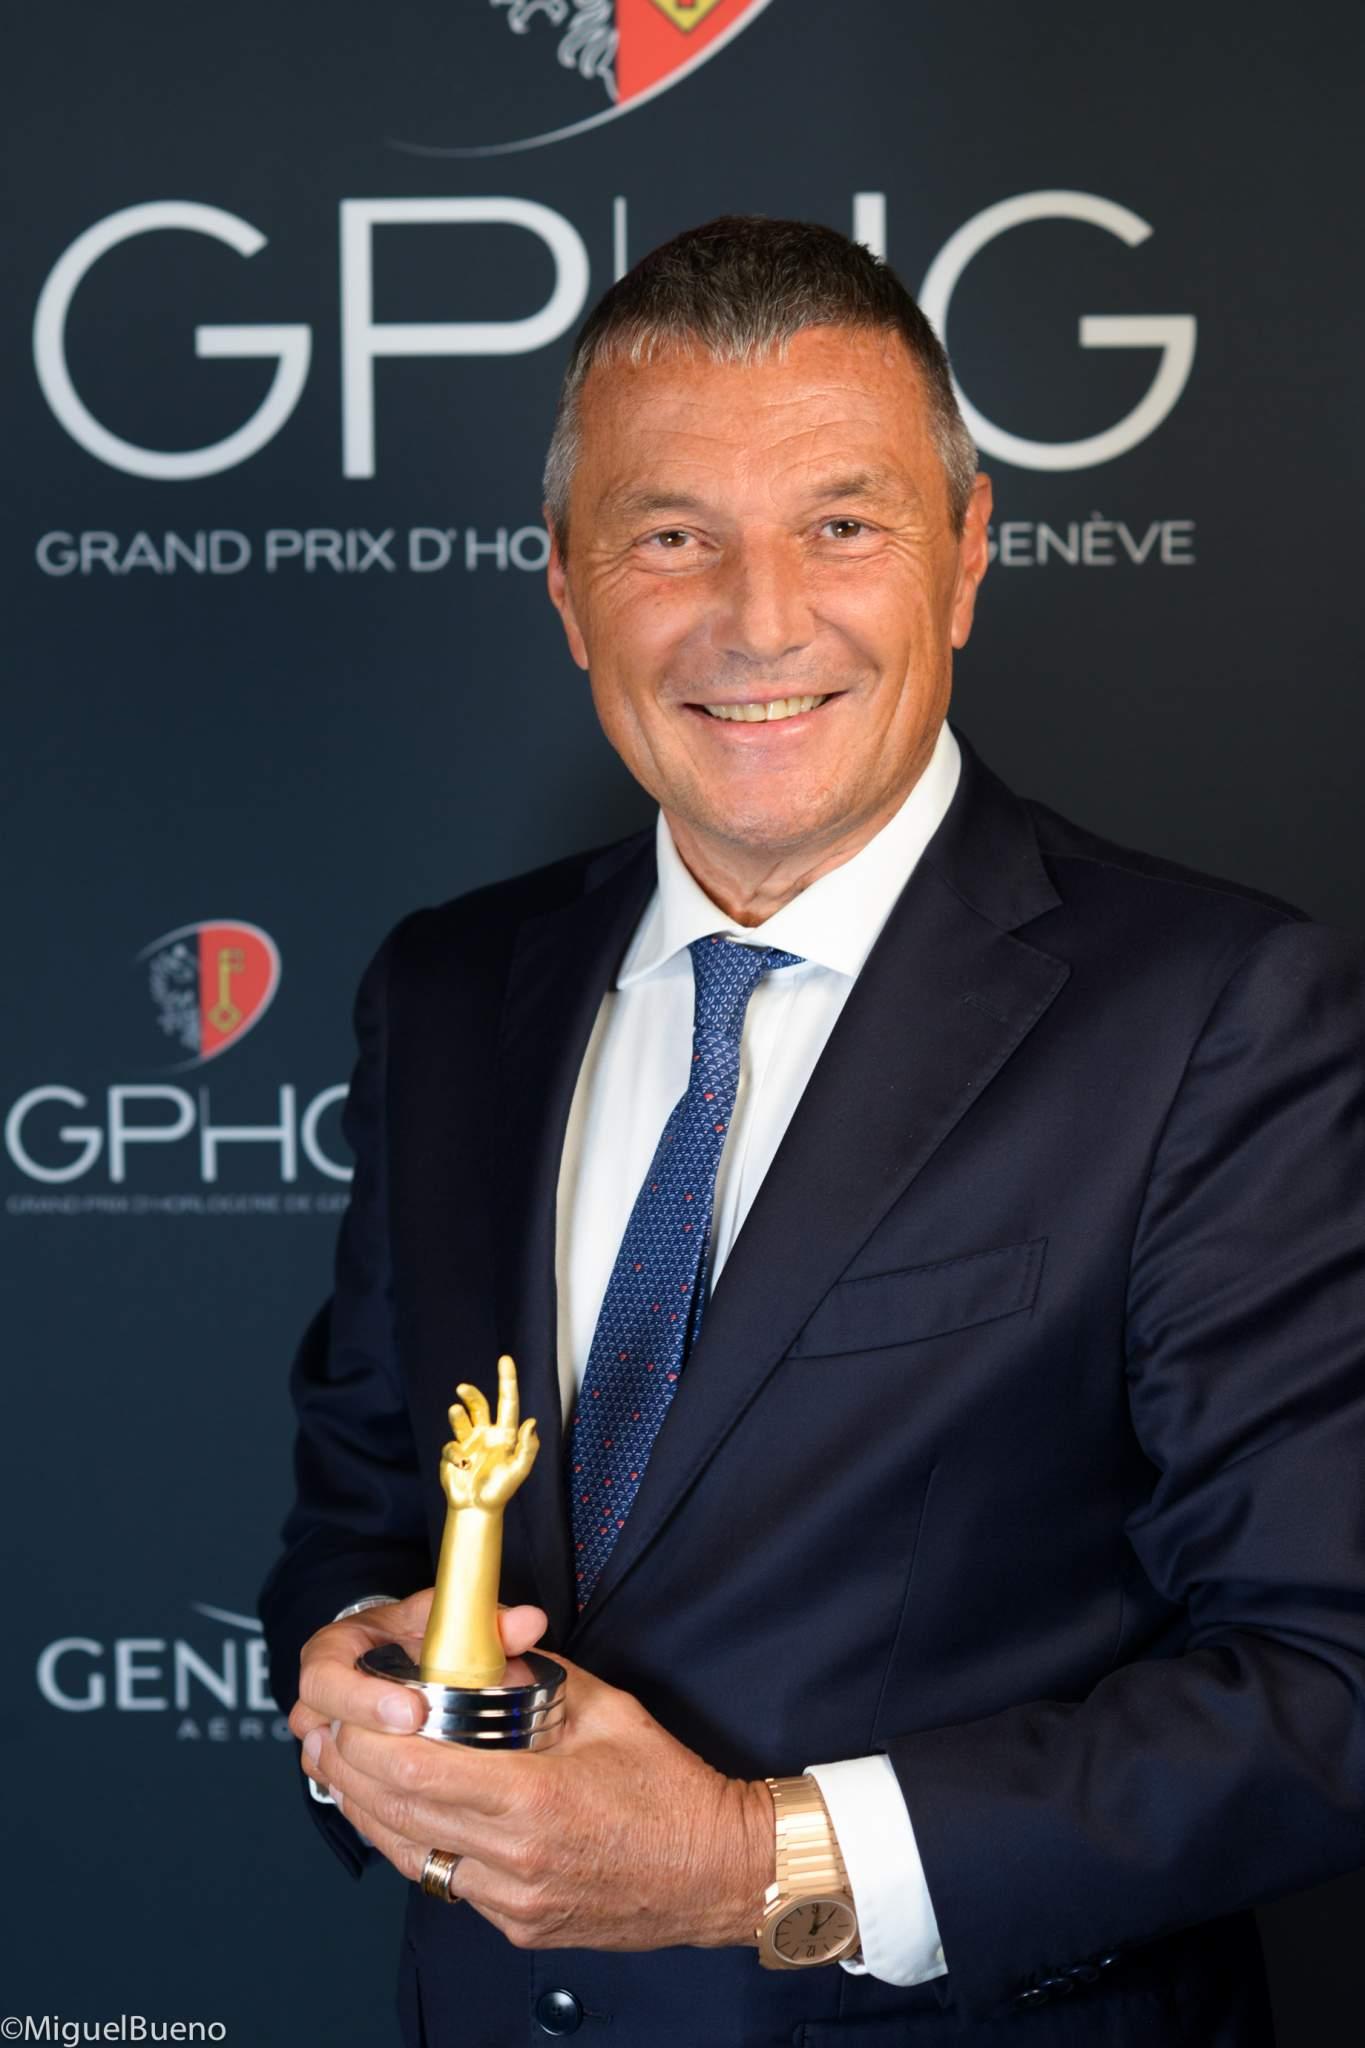 CEO of Bulgari, winner of the Jewellery Watch Prize 2019